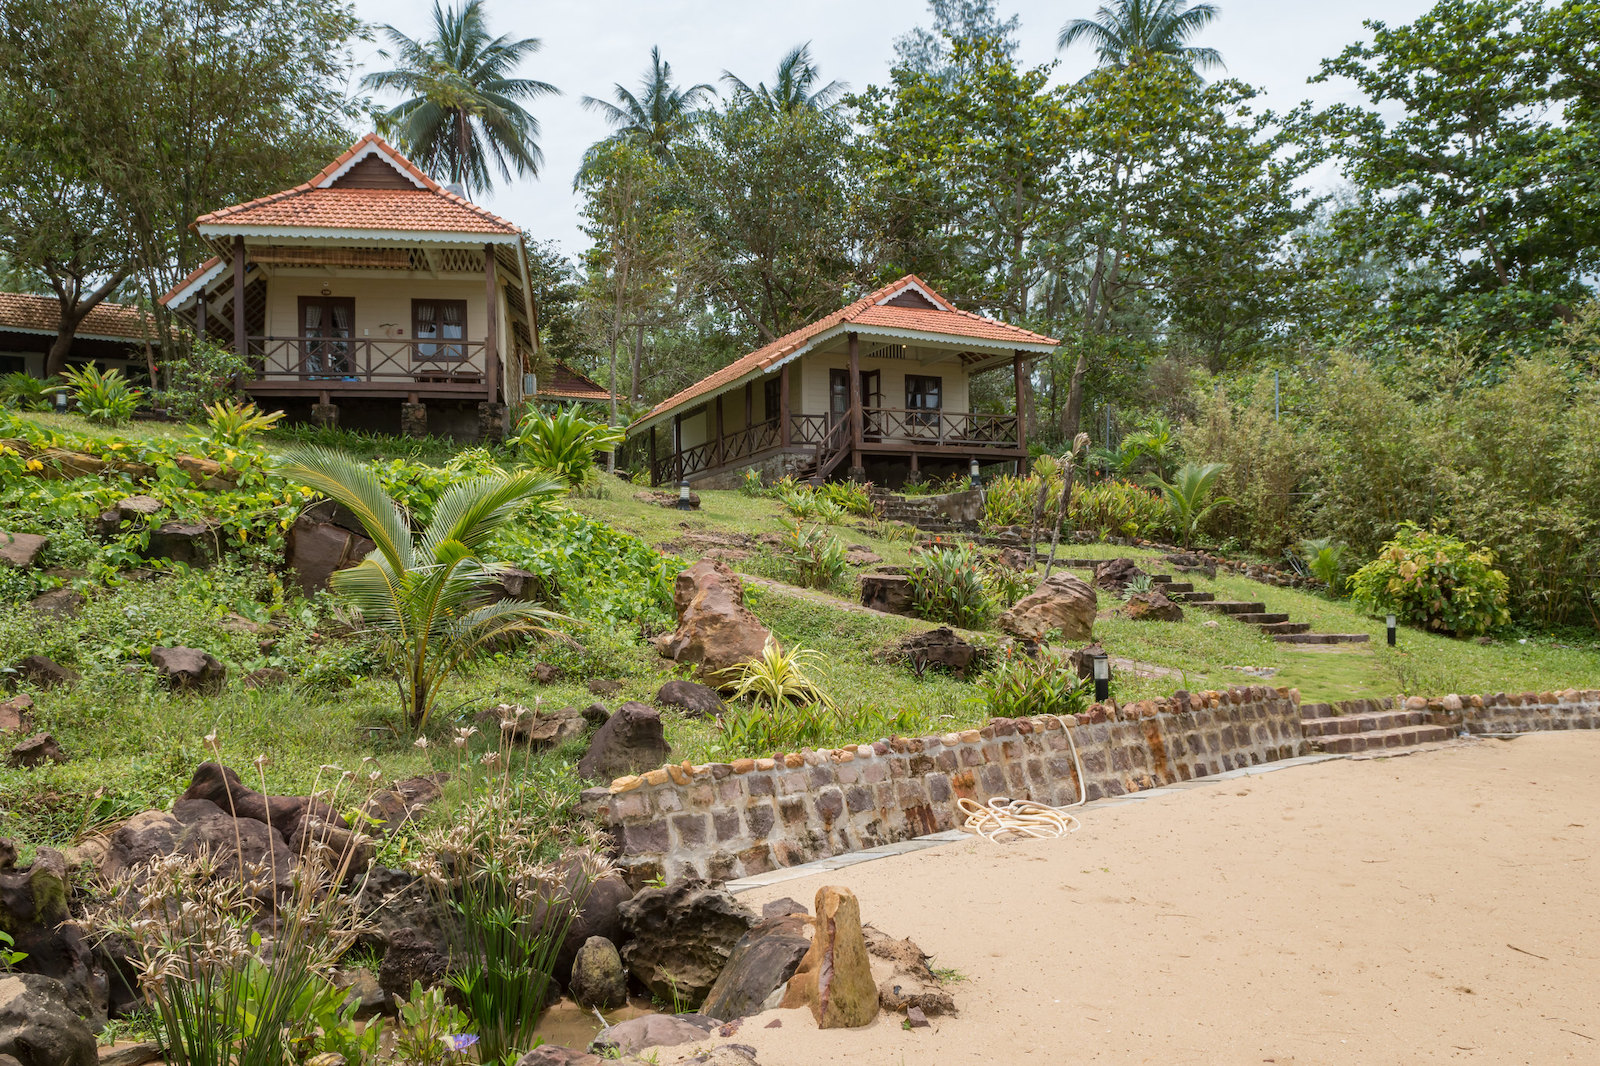 Image of beach bungalows in Phu Quoc, Vietnam